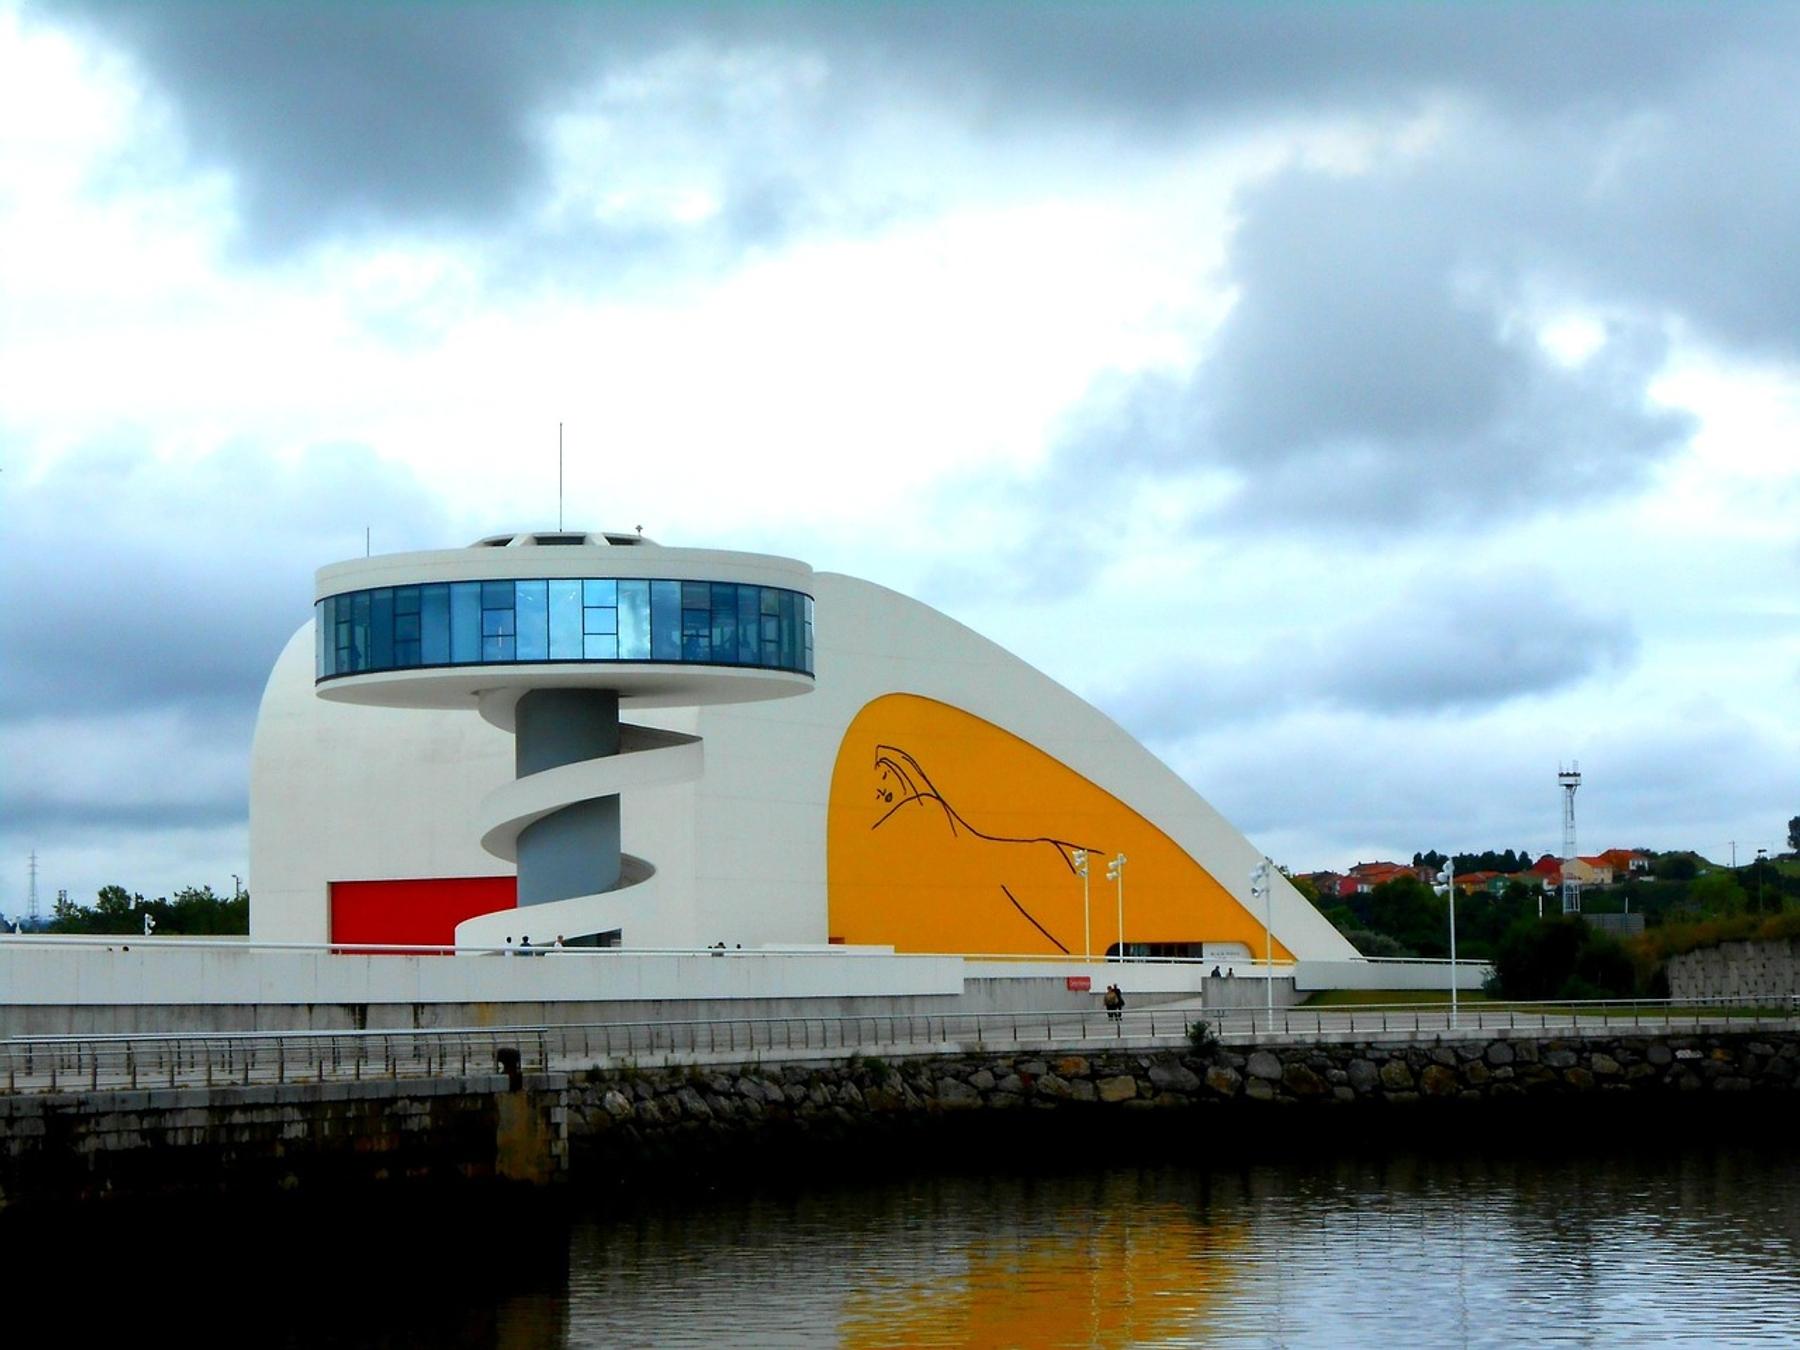 Centro Niemeyer Avilés Asturias